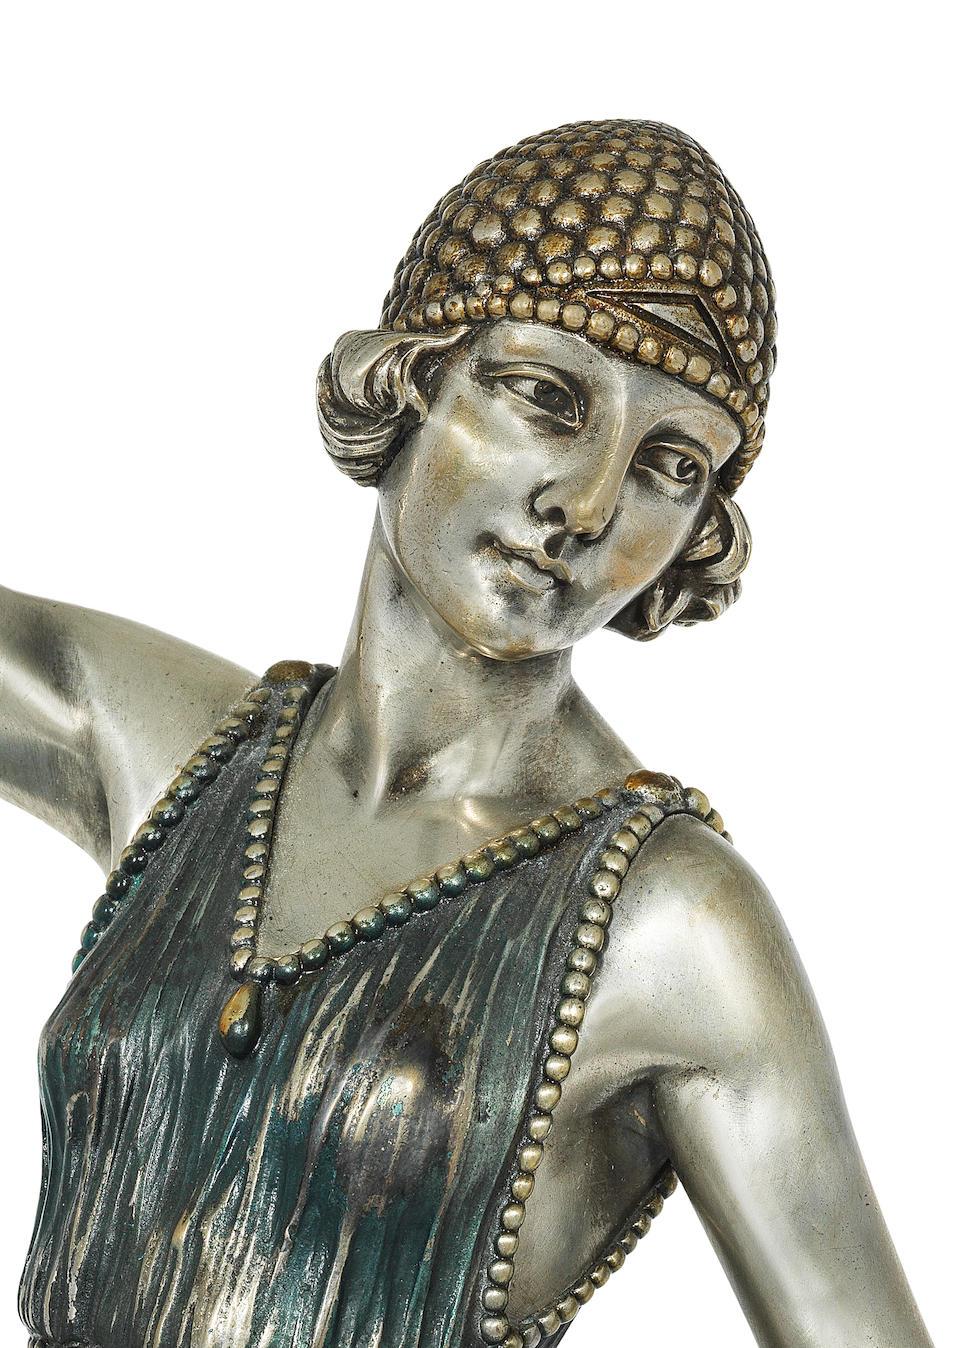 Demetre Chiparus (Romanian, 1886-1947) 'Ballet Russe': A Rare Art Deco Patinated Bronze Figure, circa 1925